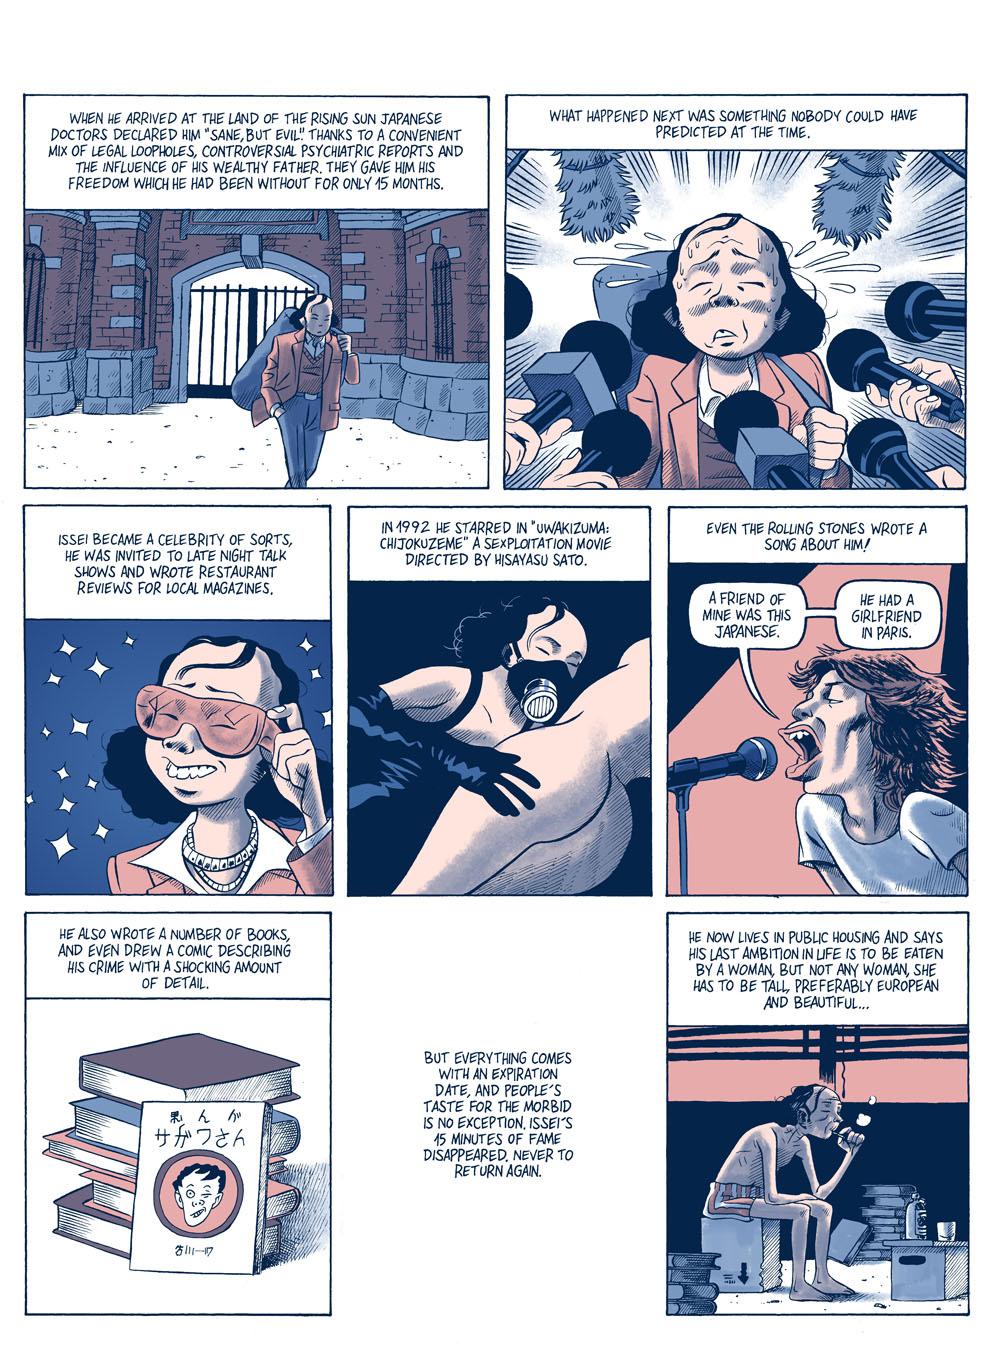 'A Hungry Artist,' Today's Comic by Matias San Juan